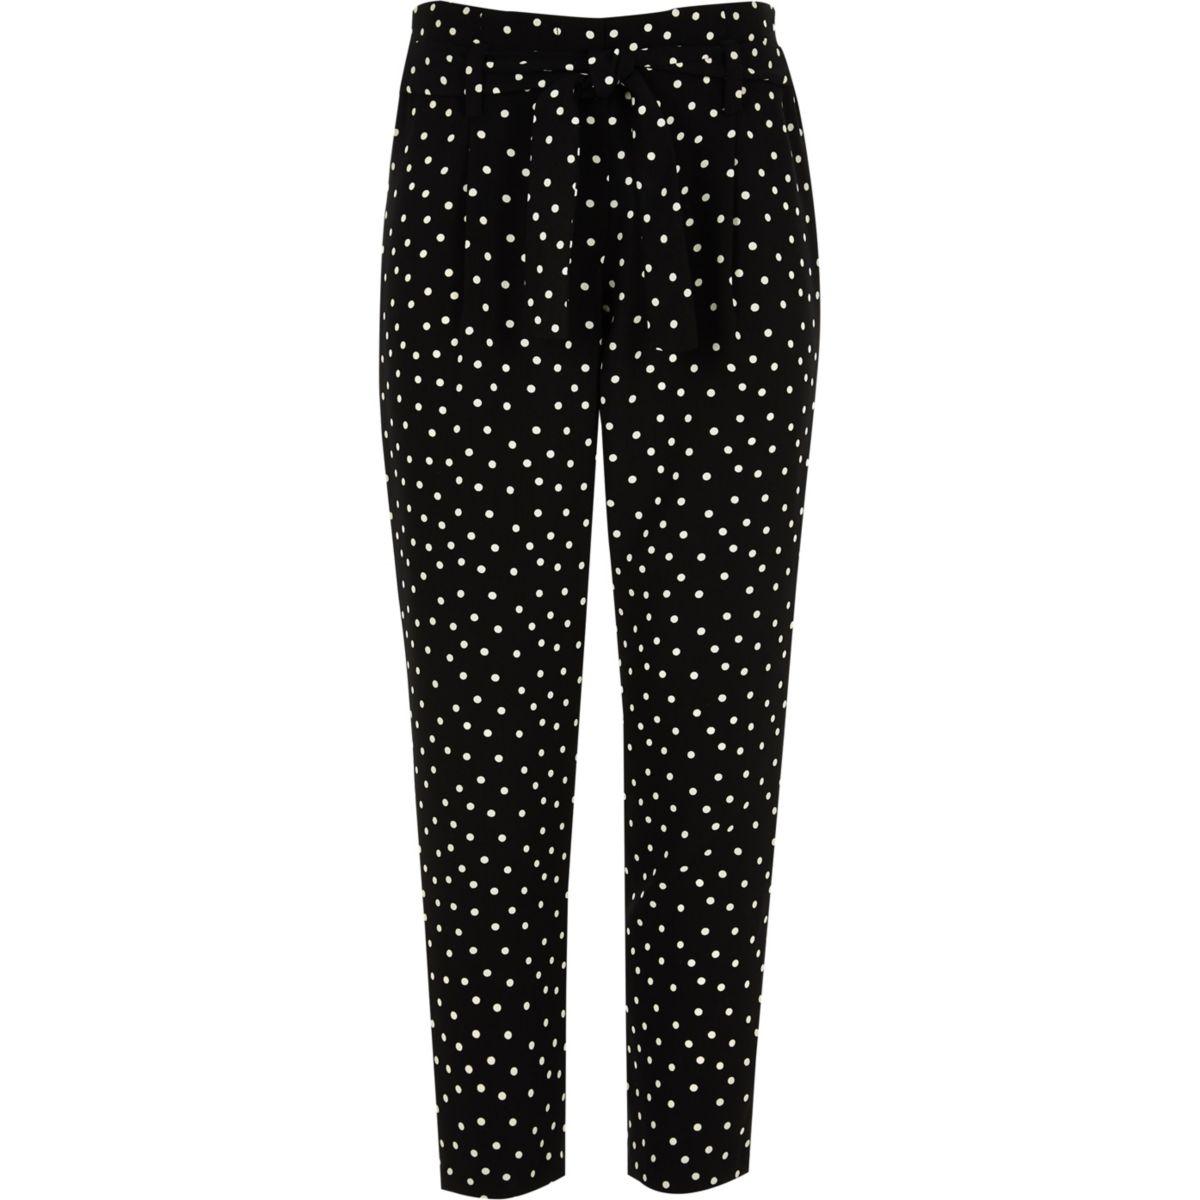 Girls black polka dot tapered trousers